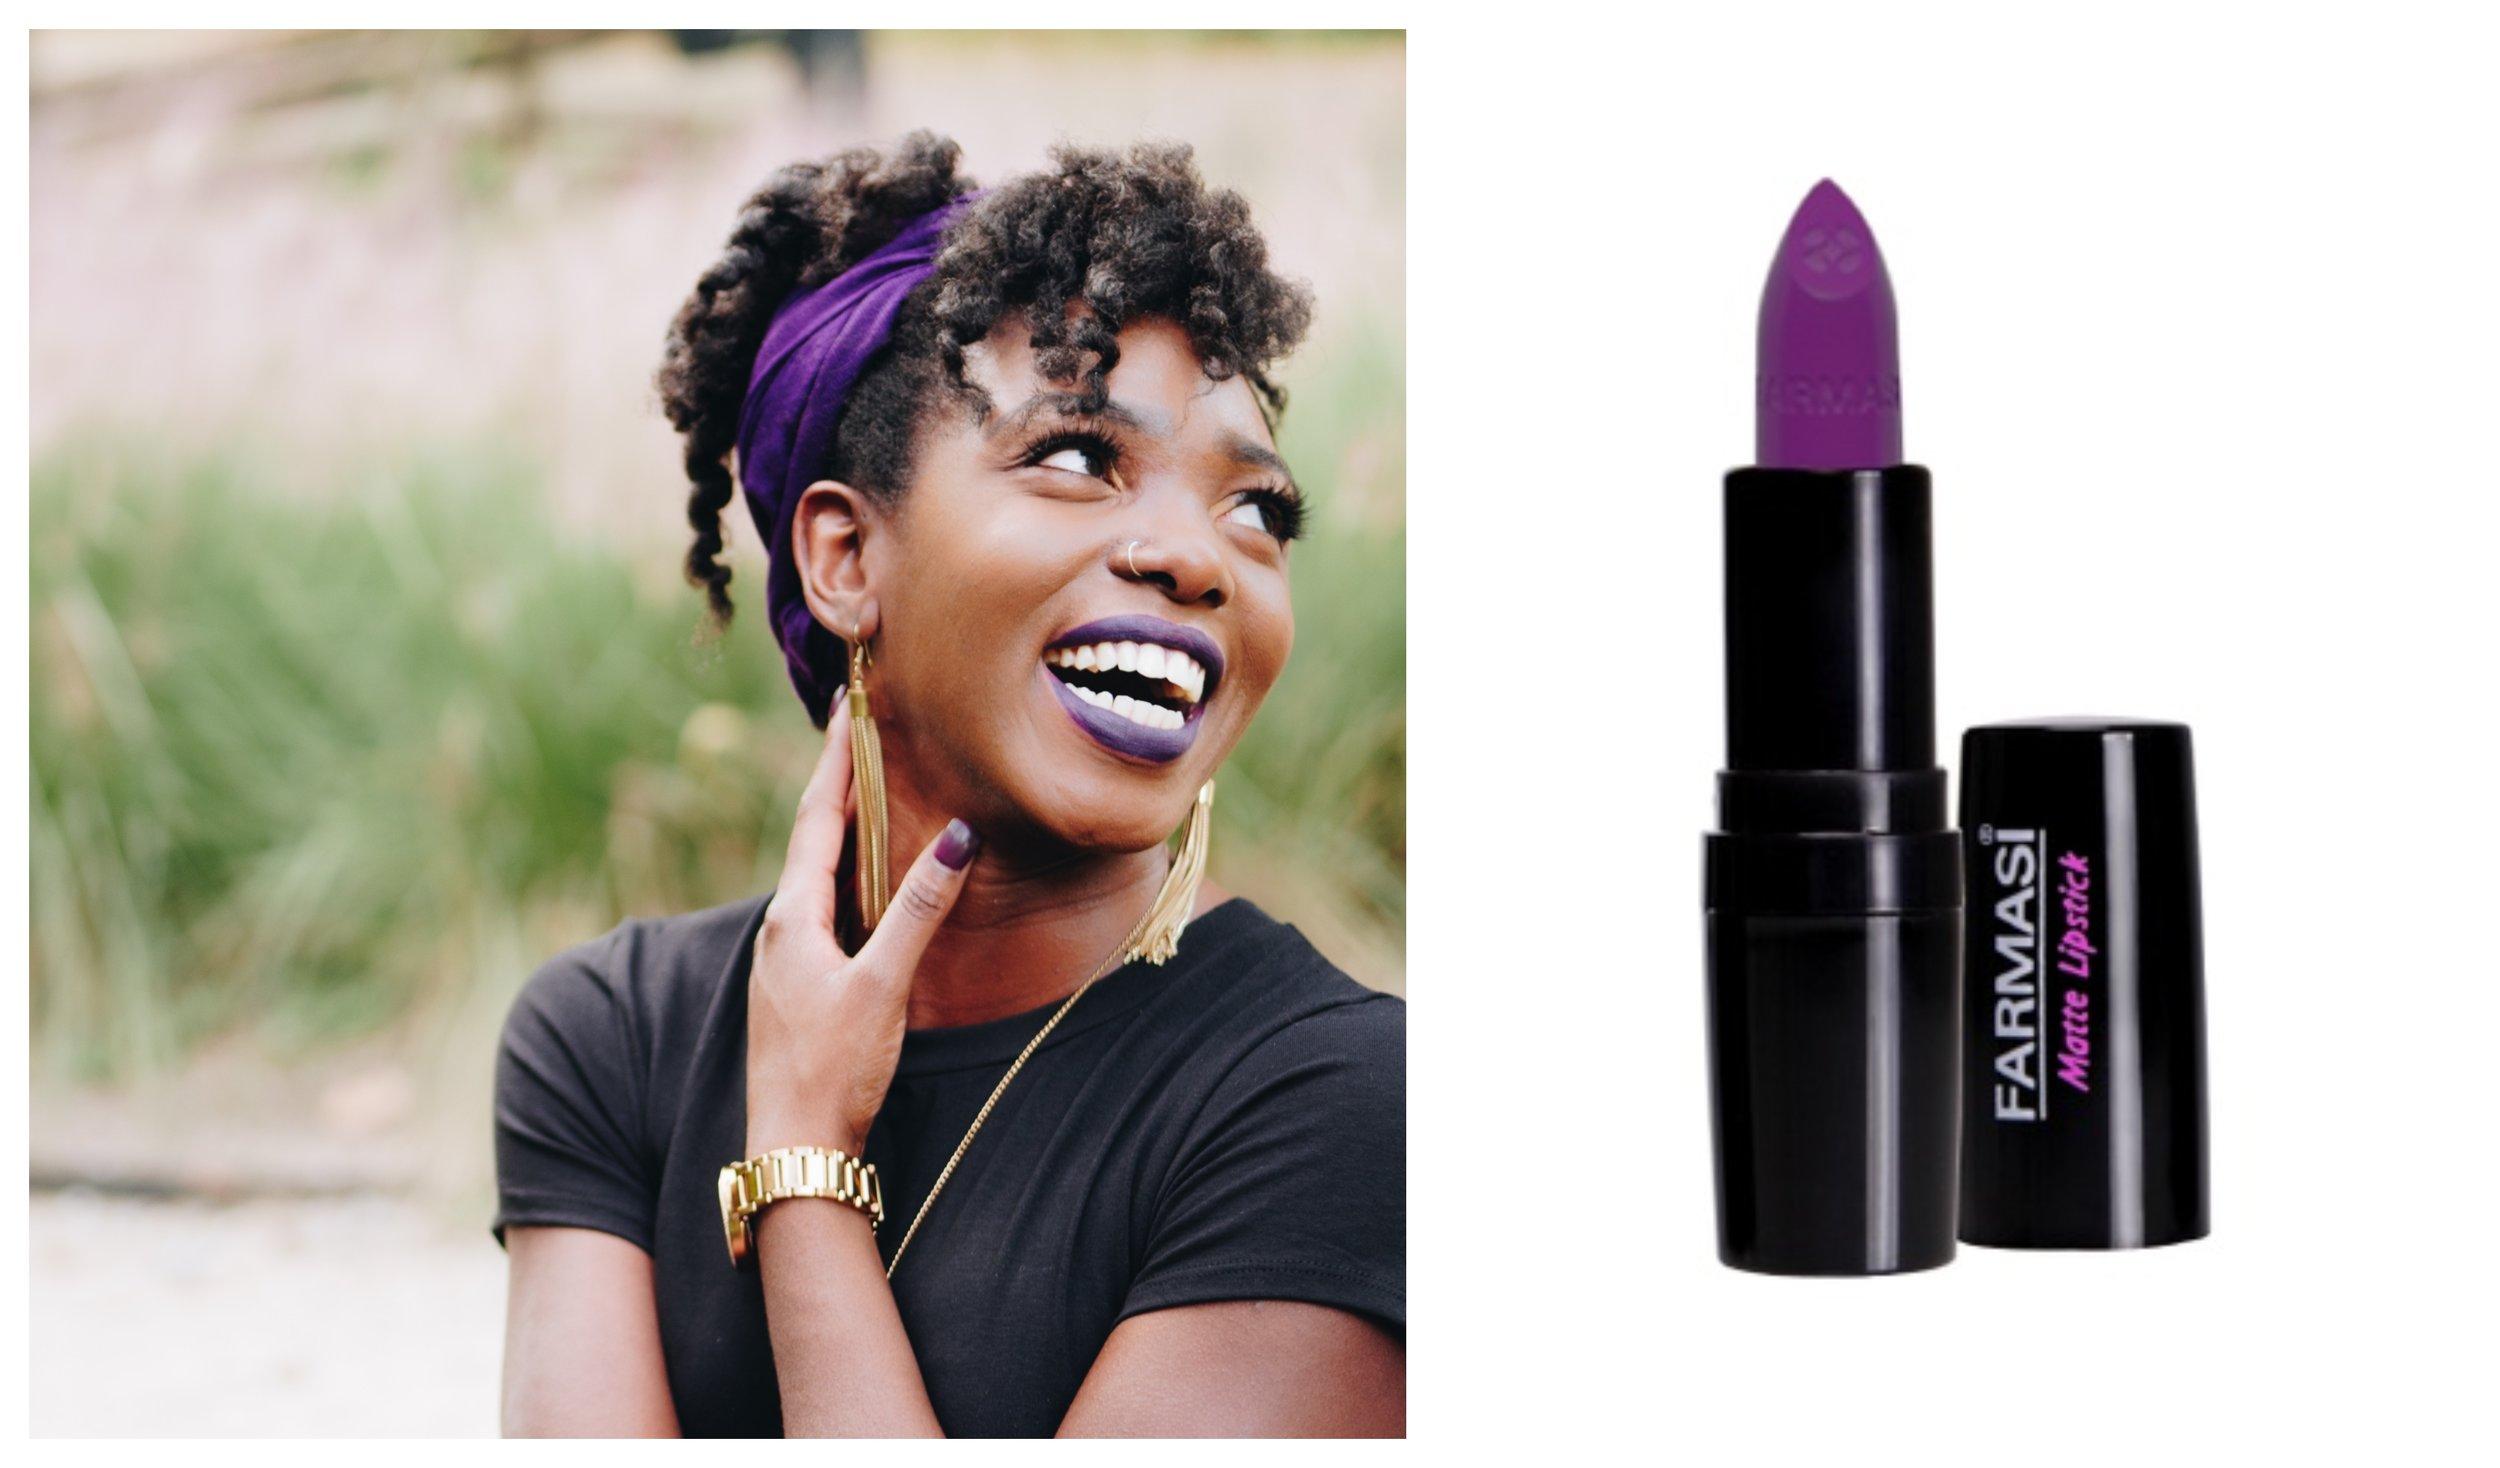 Farmasi Colour Cosmetics Matte Lipstick 20 (Vivid Violet)